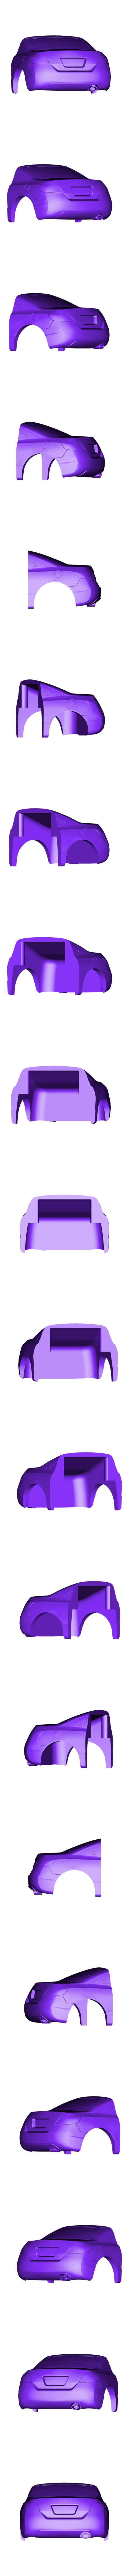 Back_Civic_2_1_28_3_v22.stl Download free STL file Honda Civic 2007 coupe body for OpenZ v16c chassis • 3D print model, guaro3d